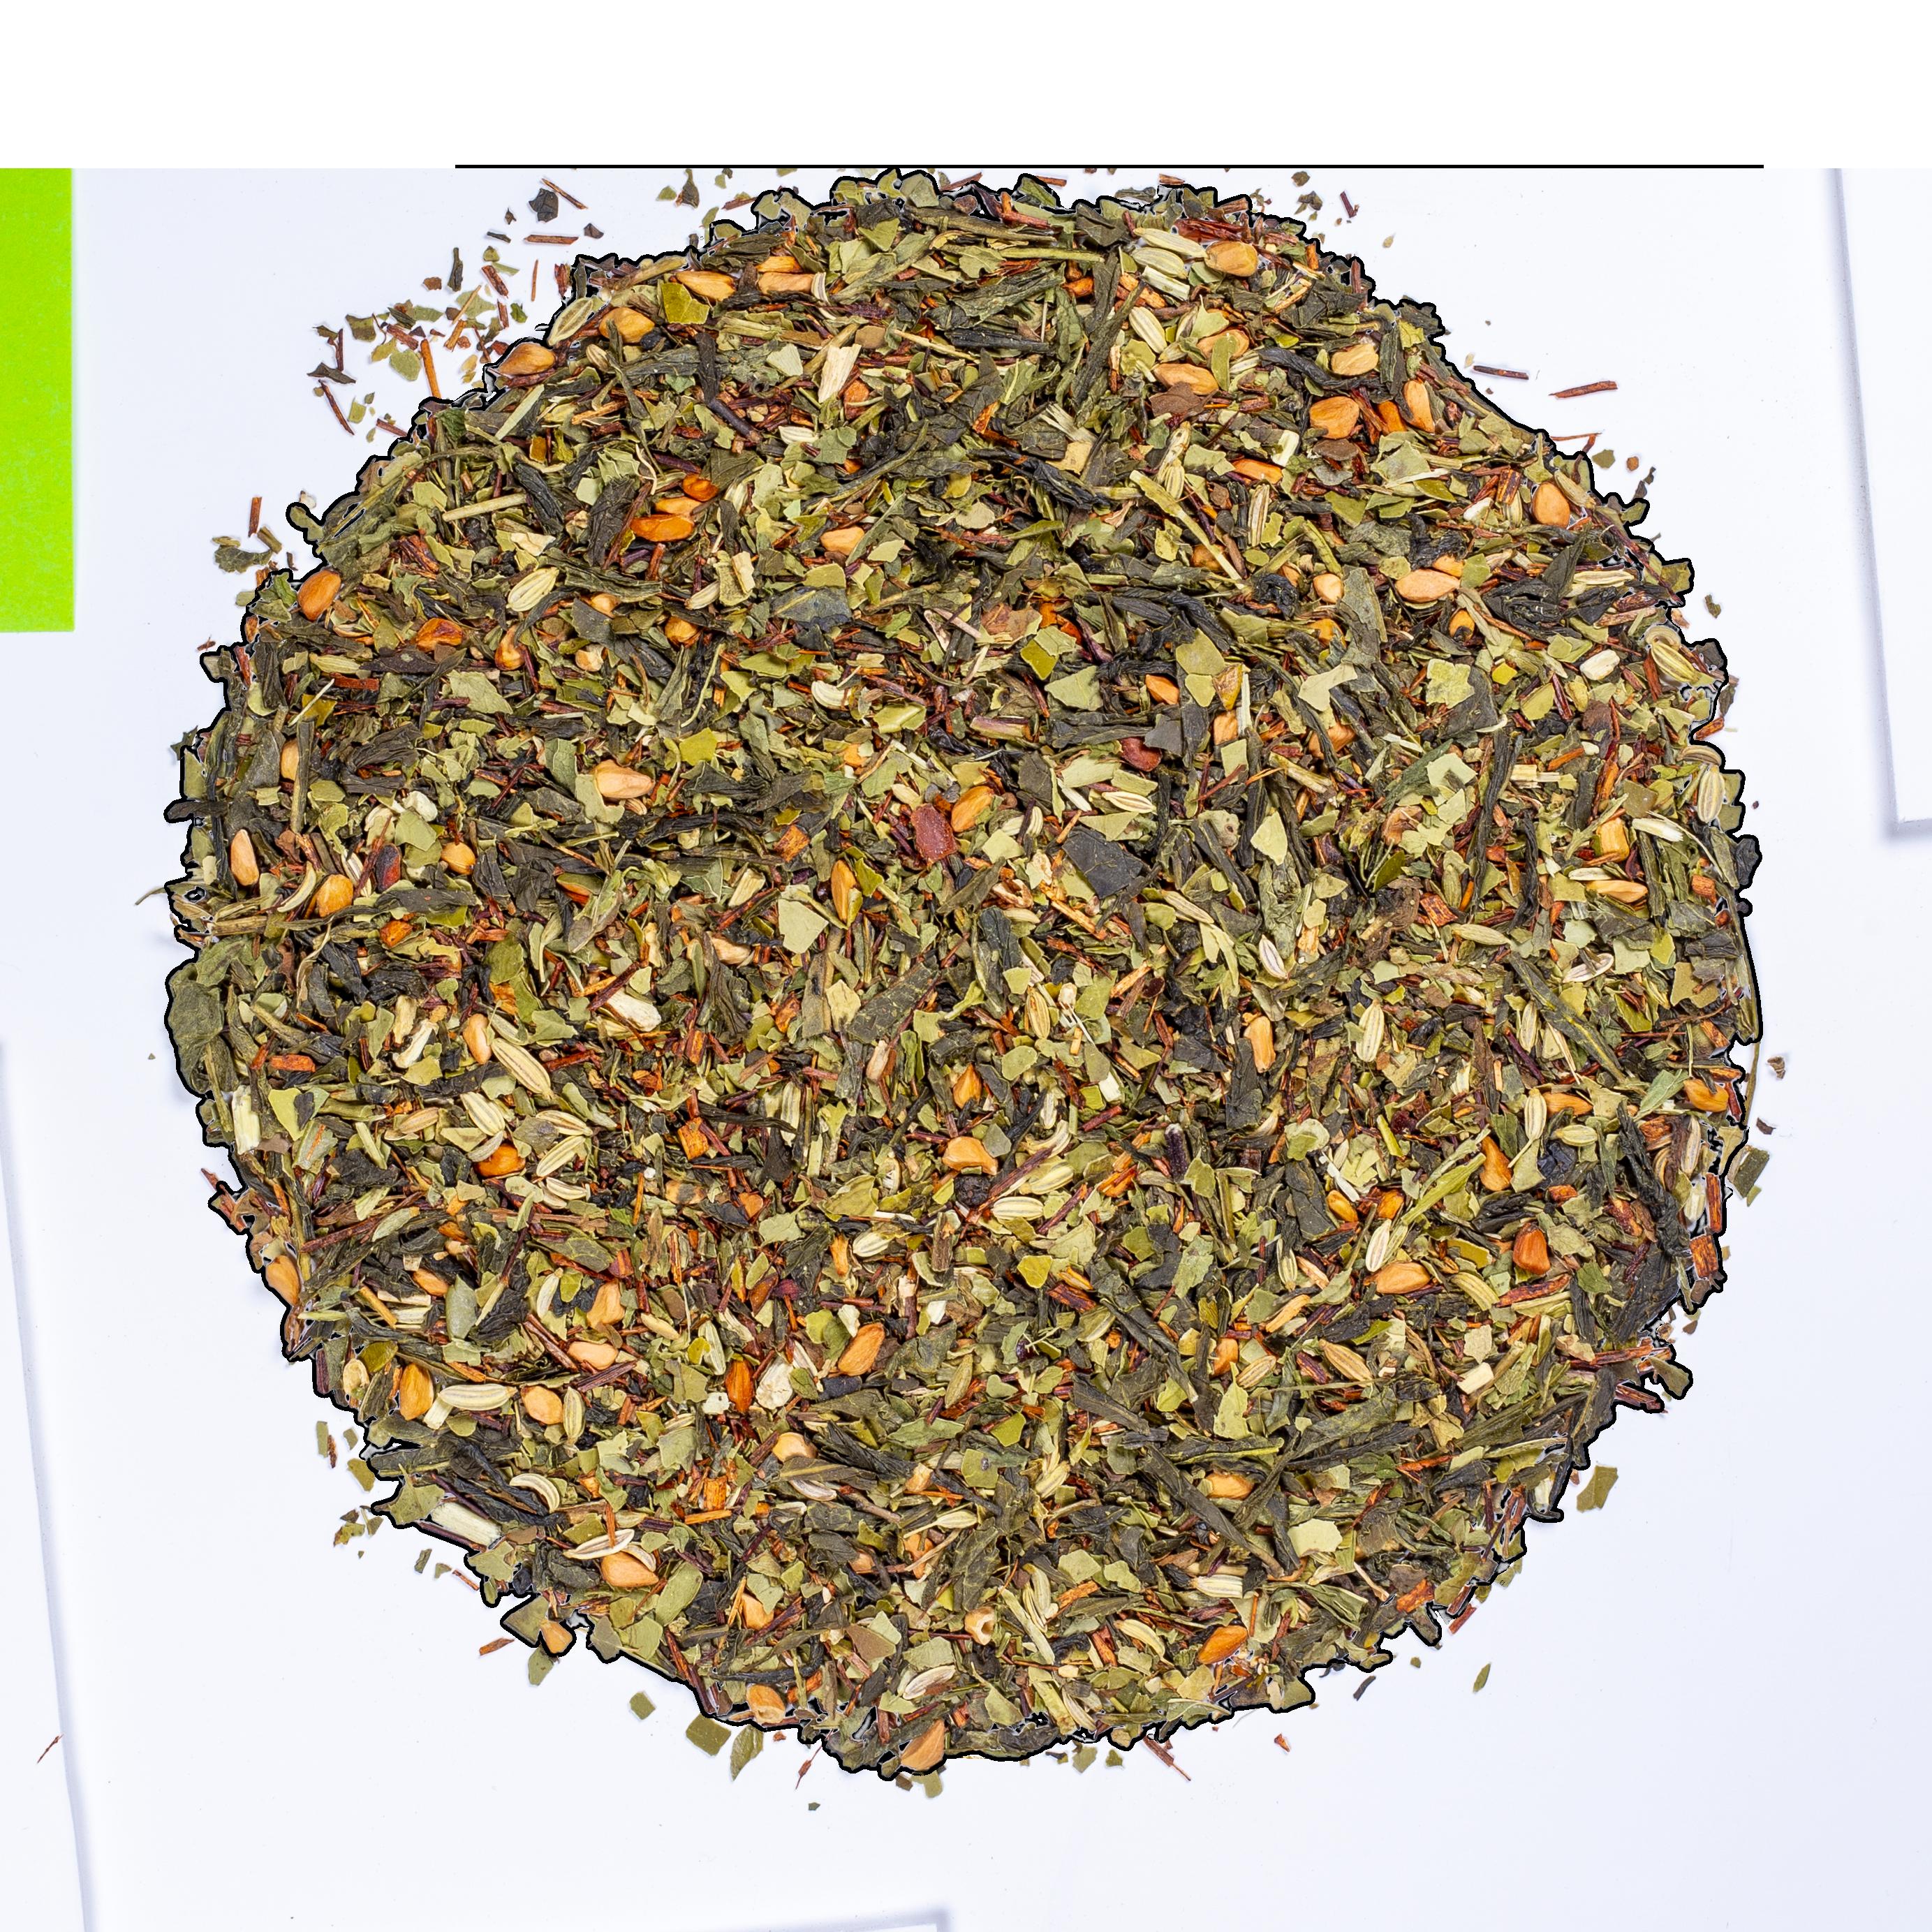 Thé vert Maté - BB Detox - Kusmi Tea - Thé vert, maté, pamplemousse